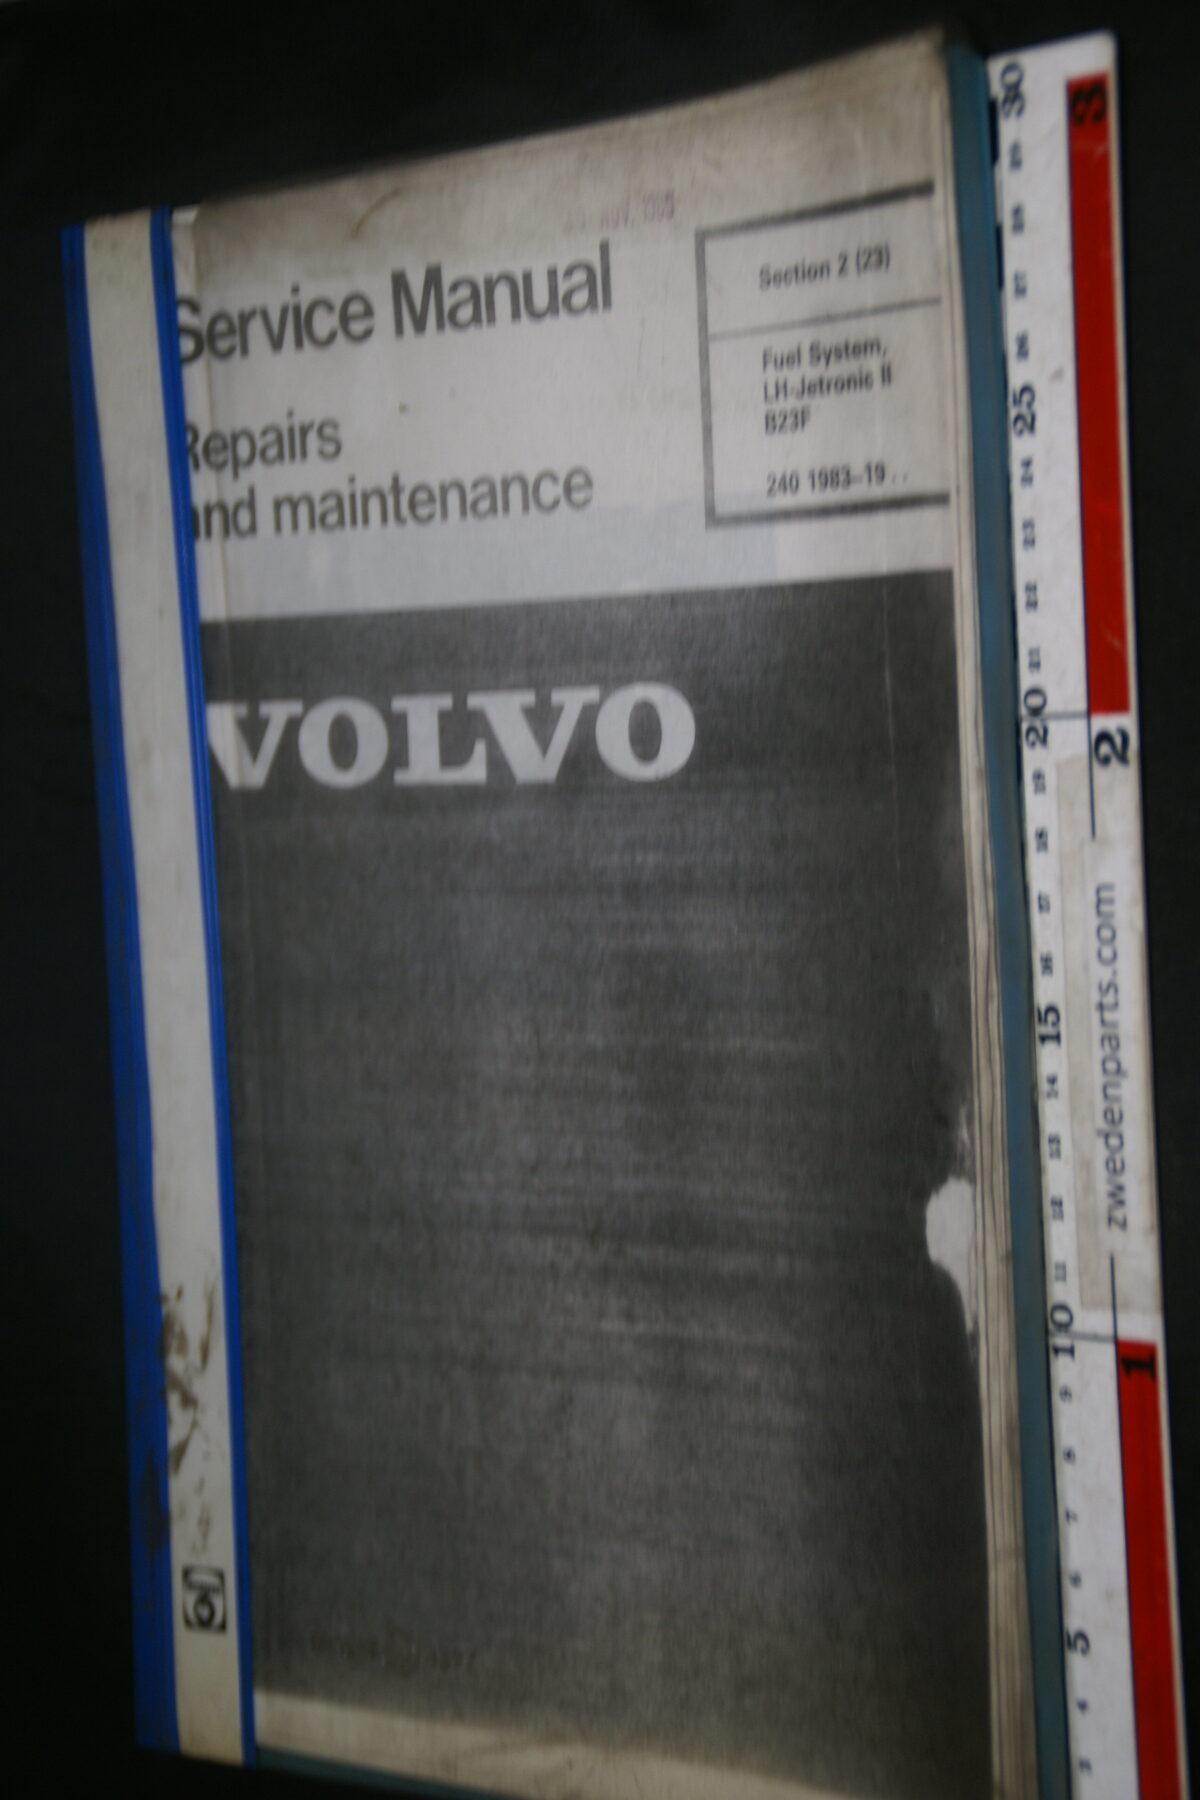 DSC09441 1983 werkplaatsboek 2 (23) Fuel System B23F  Volvo 240, English